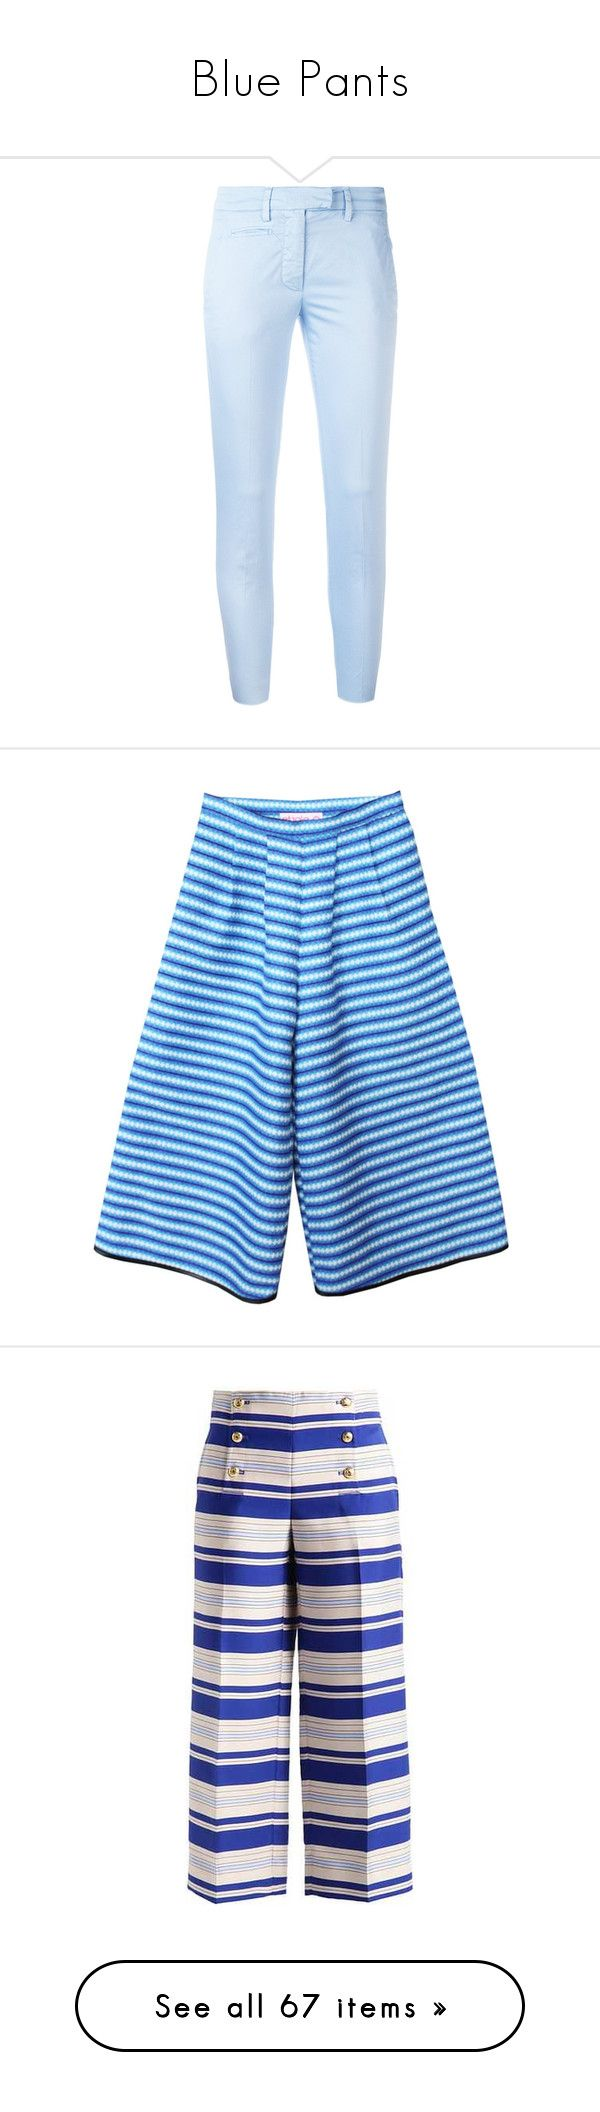 """Blue Pants"" by kikikoji ❤ liked on Polyvore featuring pants, jeans, bottoms, denim, light blue, light blue pants, skinny trousers, dondup, skinny pants and blue skinny pants"